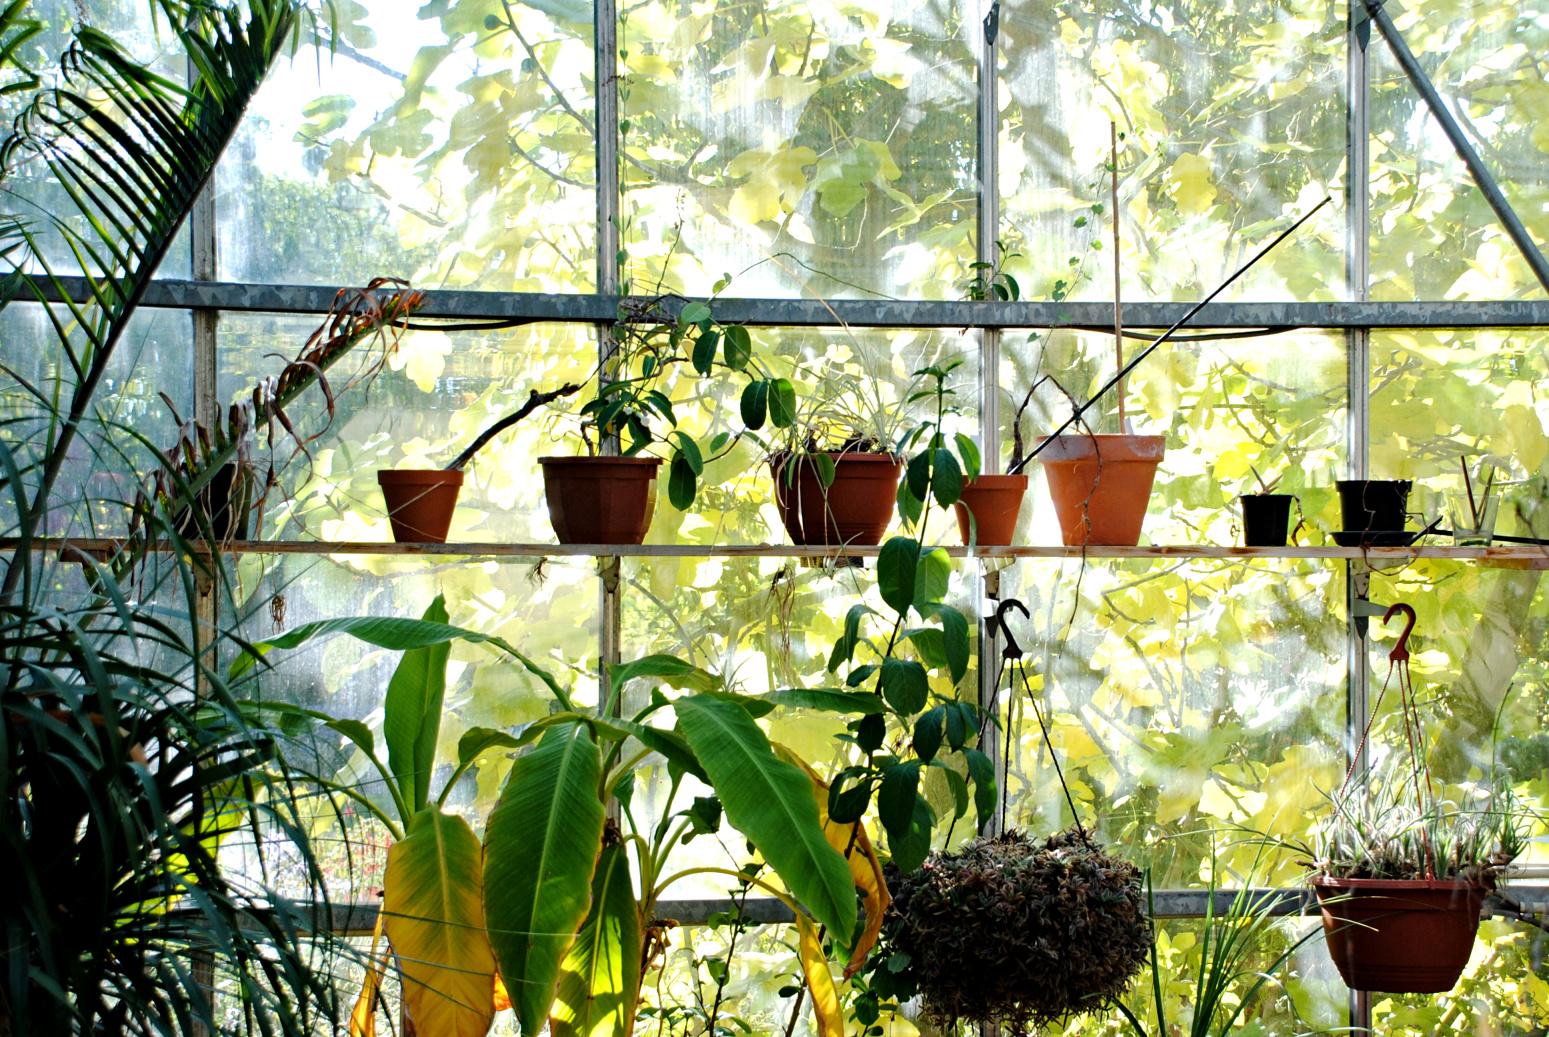 Botanischer garten Kerkrade